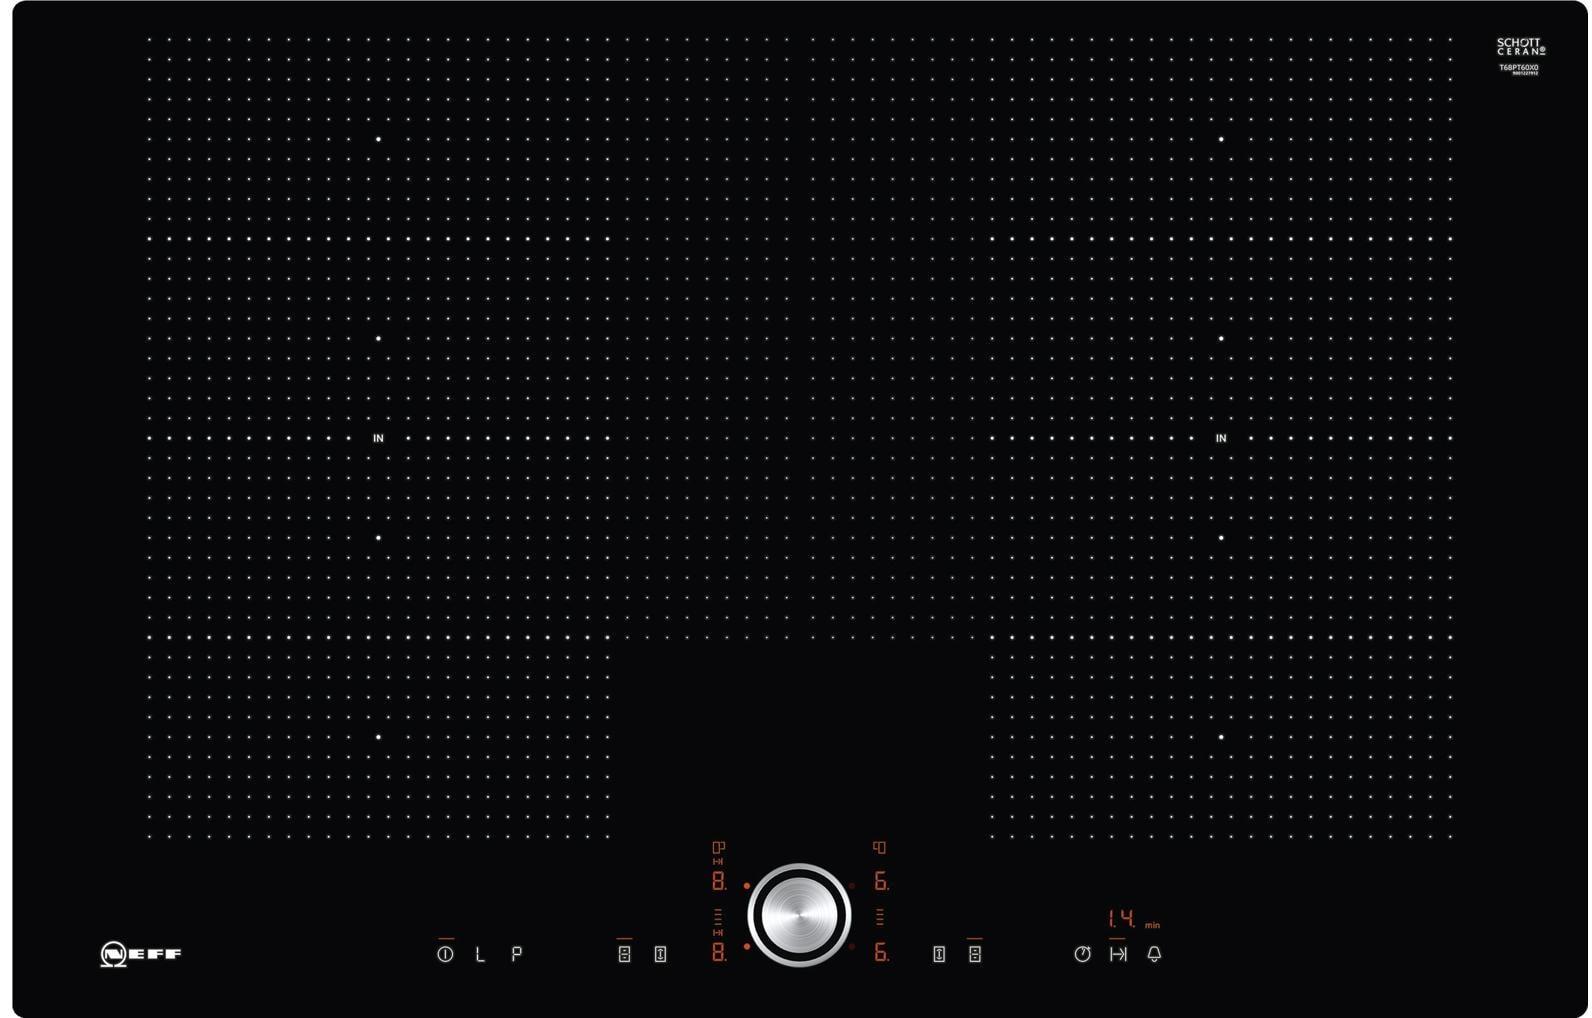 neff tpt 6860 x t68pt60x0 autarkes induktions kochfeld glaskeramik fl chenb ndig schwarz. Black Bedroom Furniture Sets. Home Design Ideas